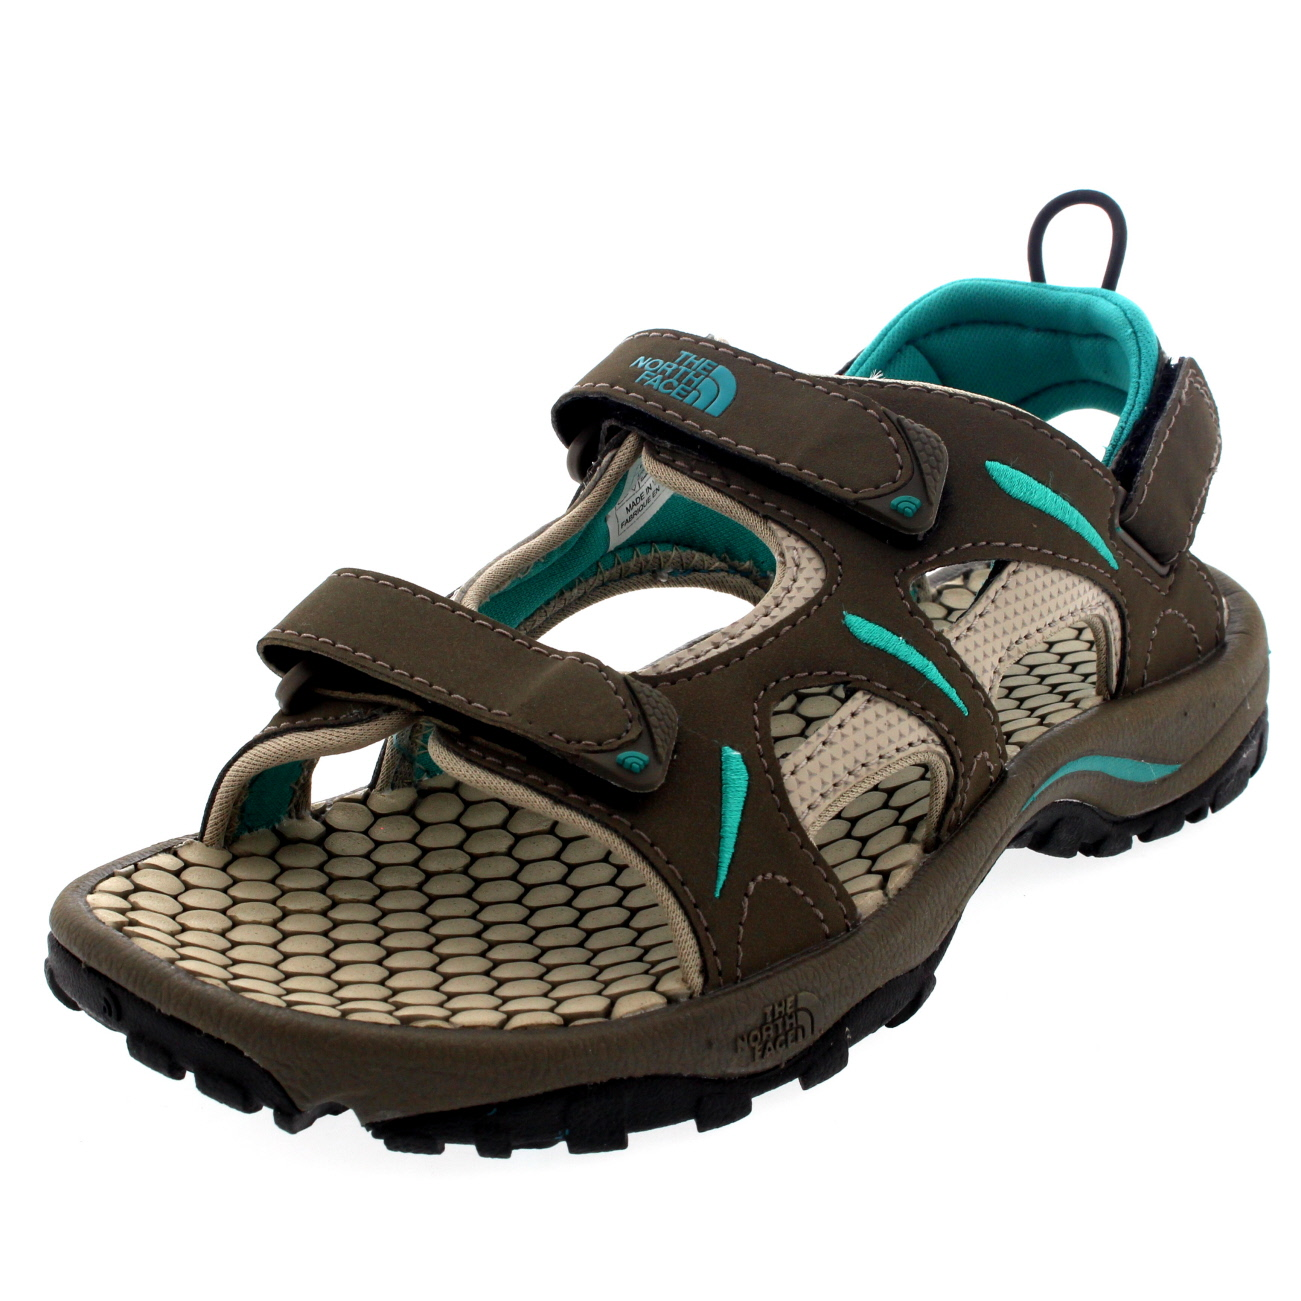 Northface Ladies Walking Shoes